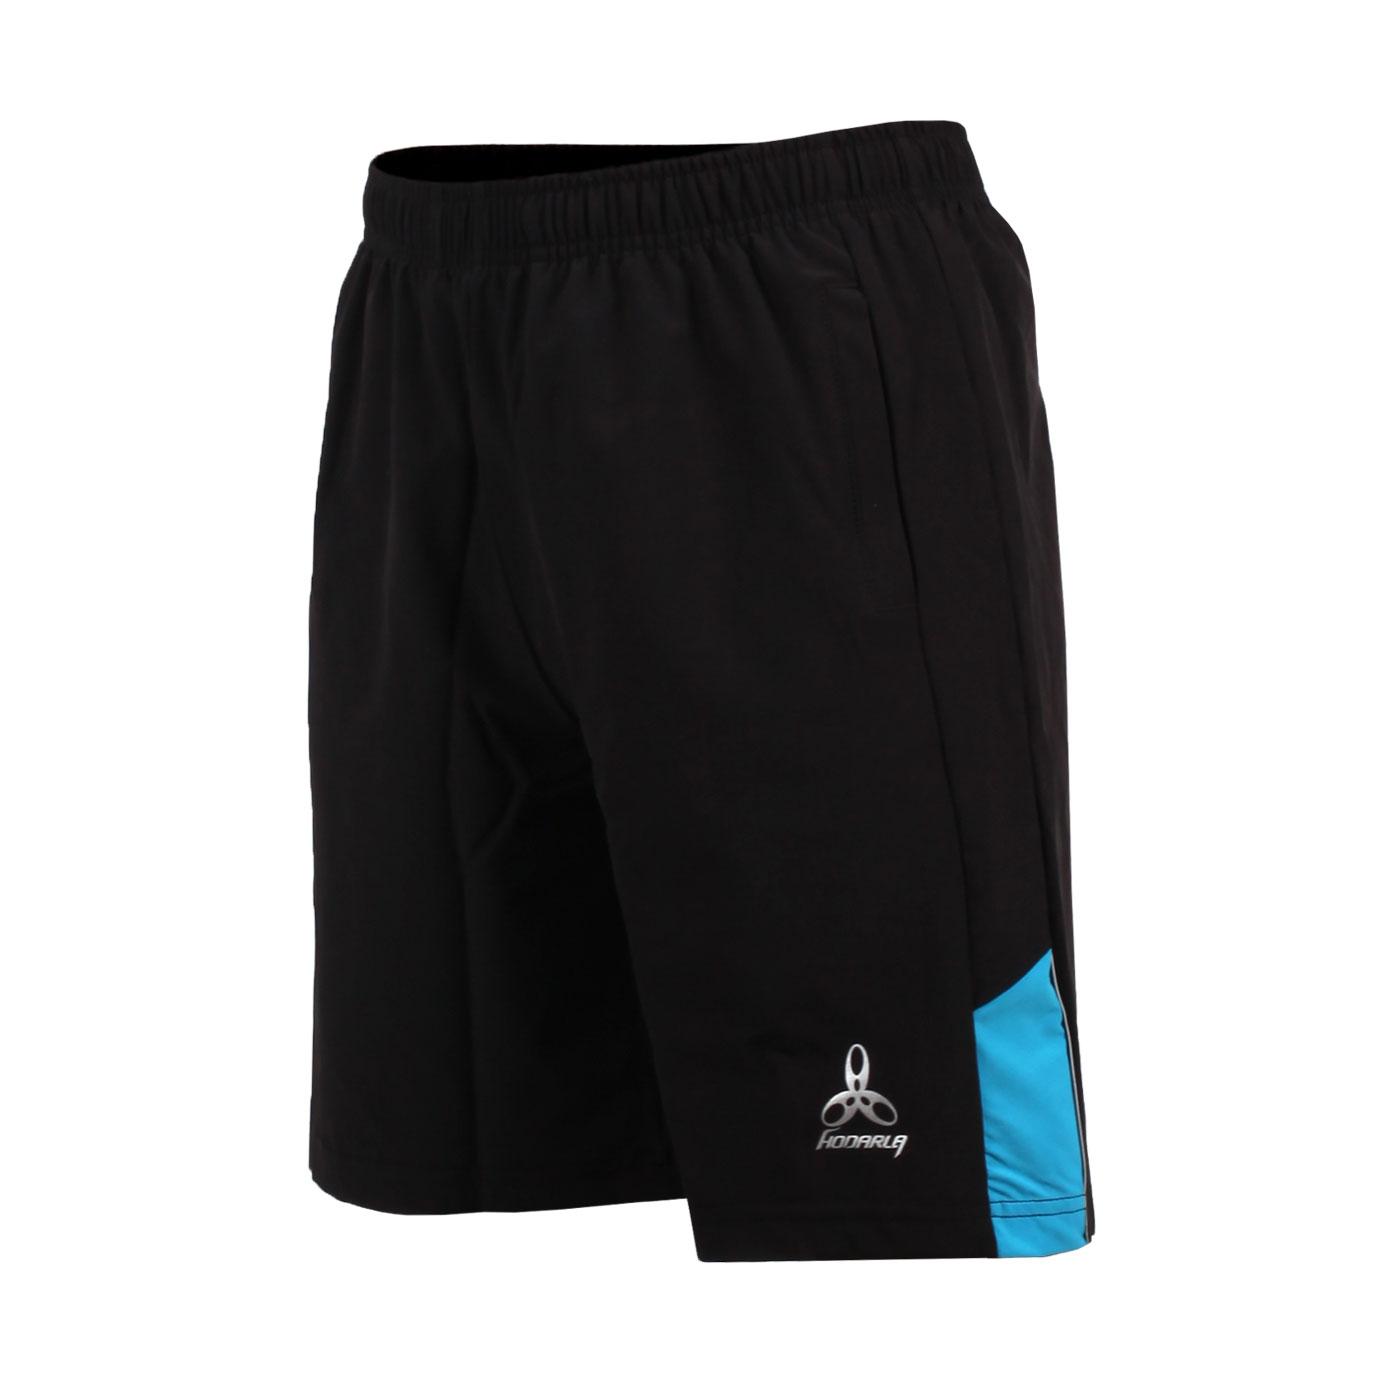 HODARLA 男-競技平織彈性短褲 3139001 - 黑淺藍